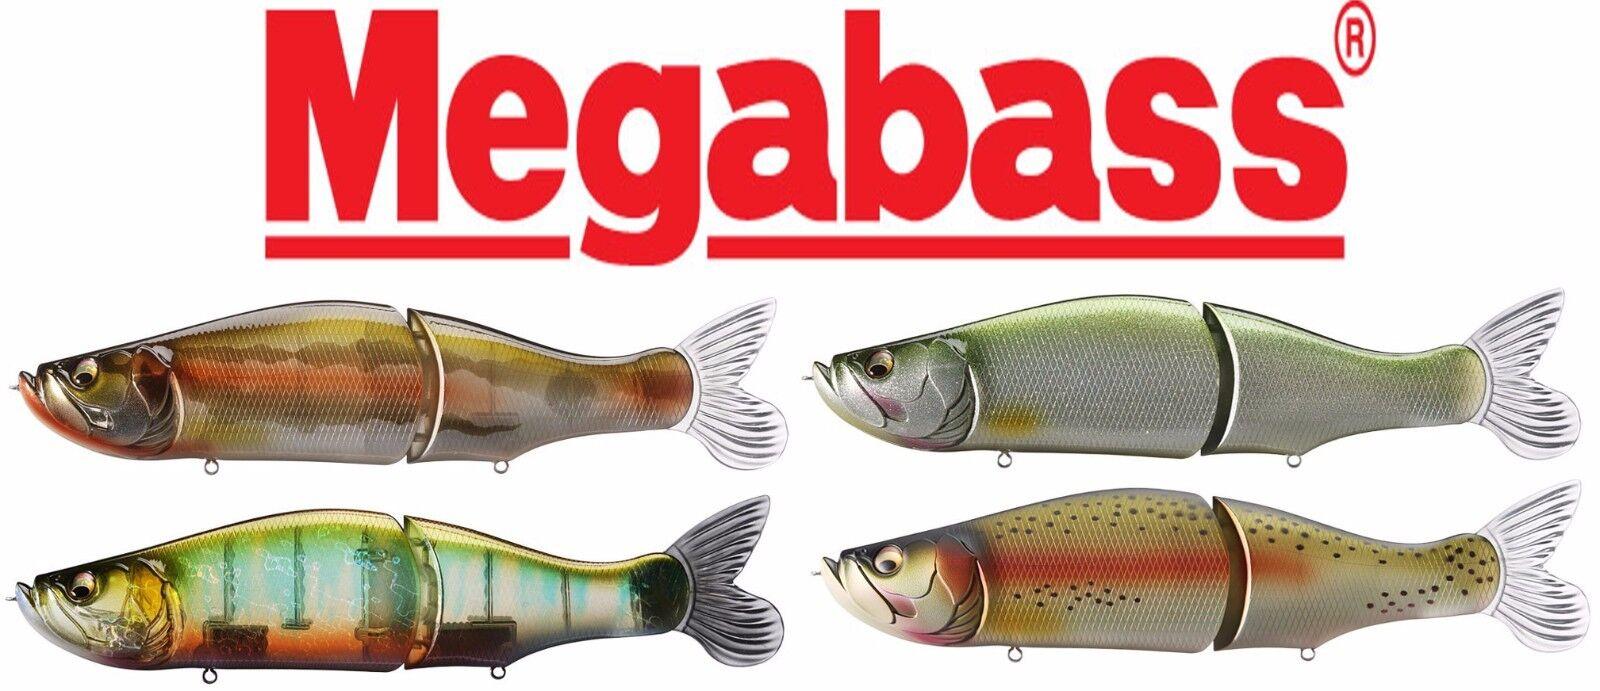 Megabass deslizo 262T-duro cuerpo Glide Swimbait 10 1 3  (26Cm) Señuelos De Pesca